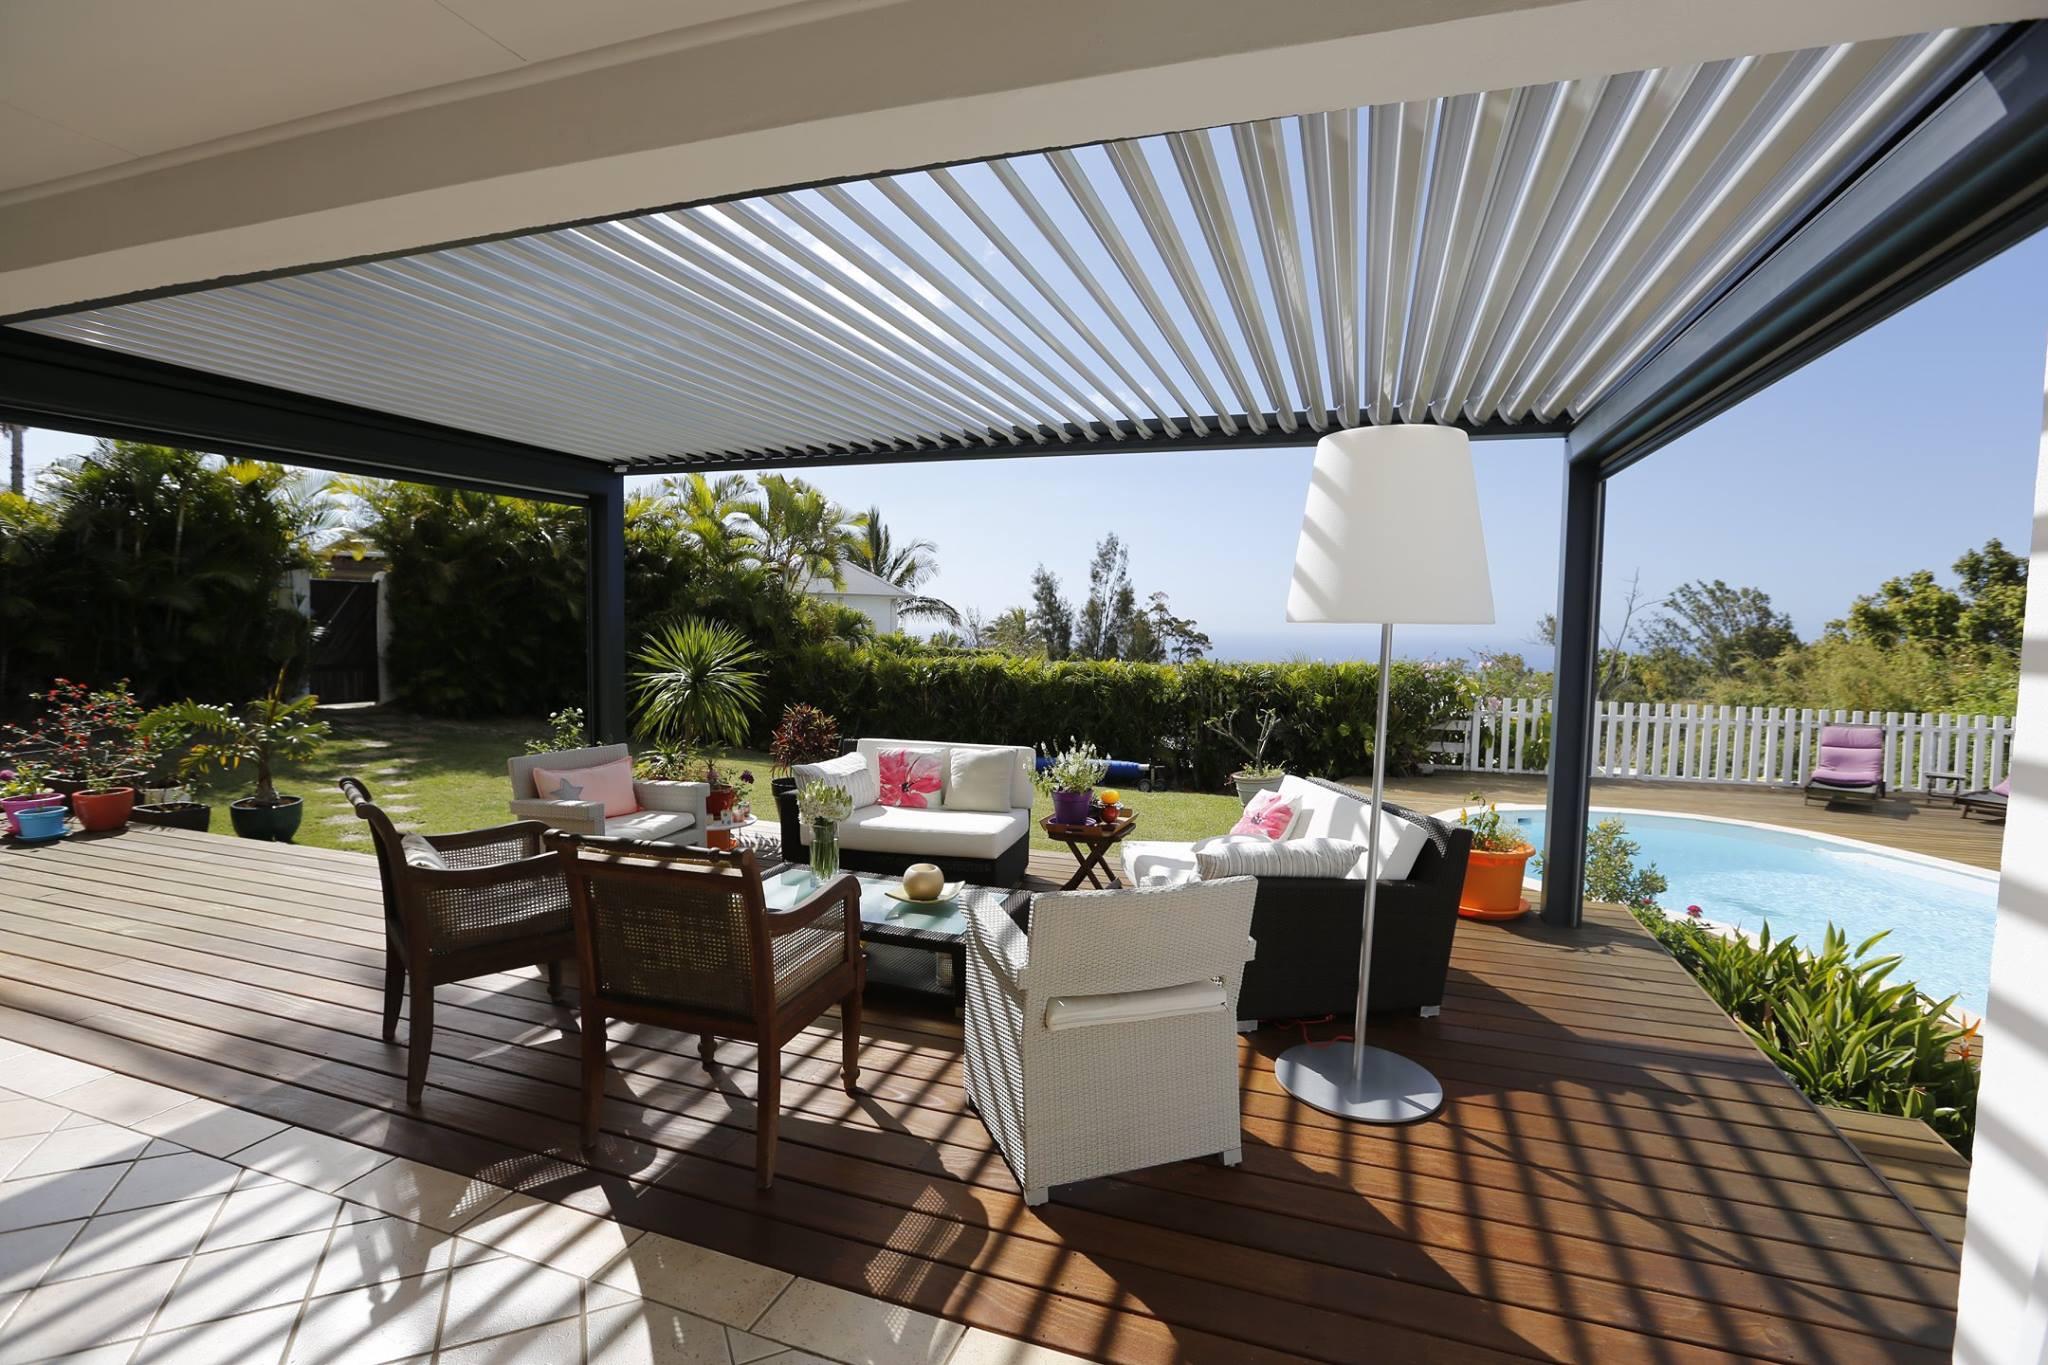 Para terrazas precios precio banco de madera para exterior color natural con respaldo jardn - Toldos terrazas precios ...